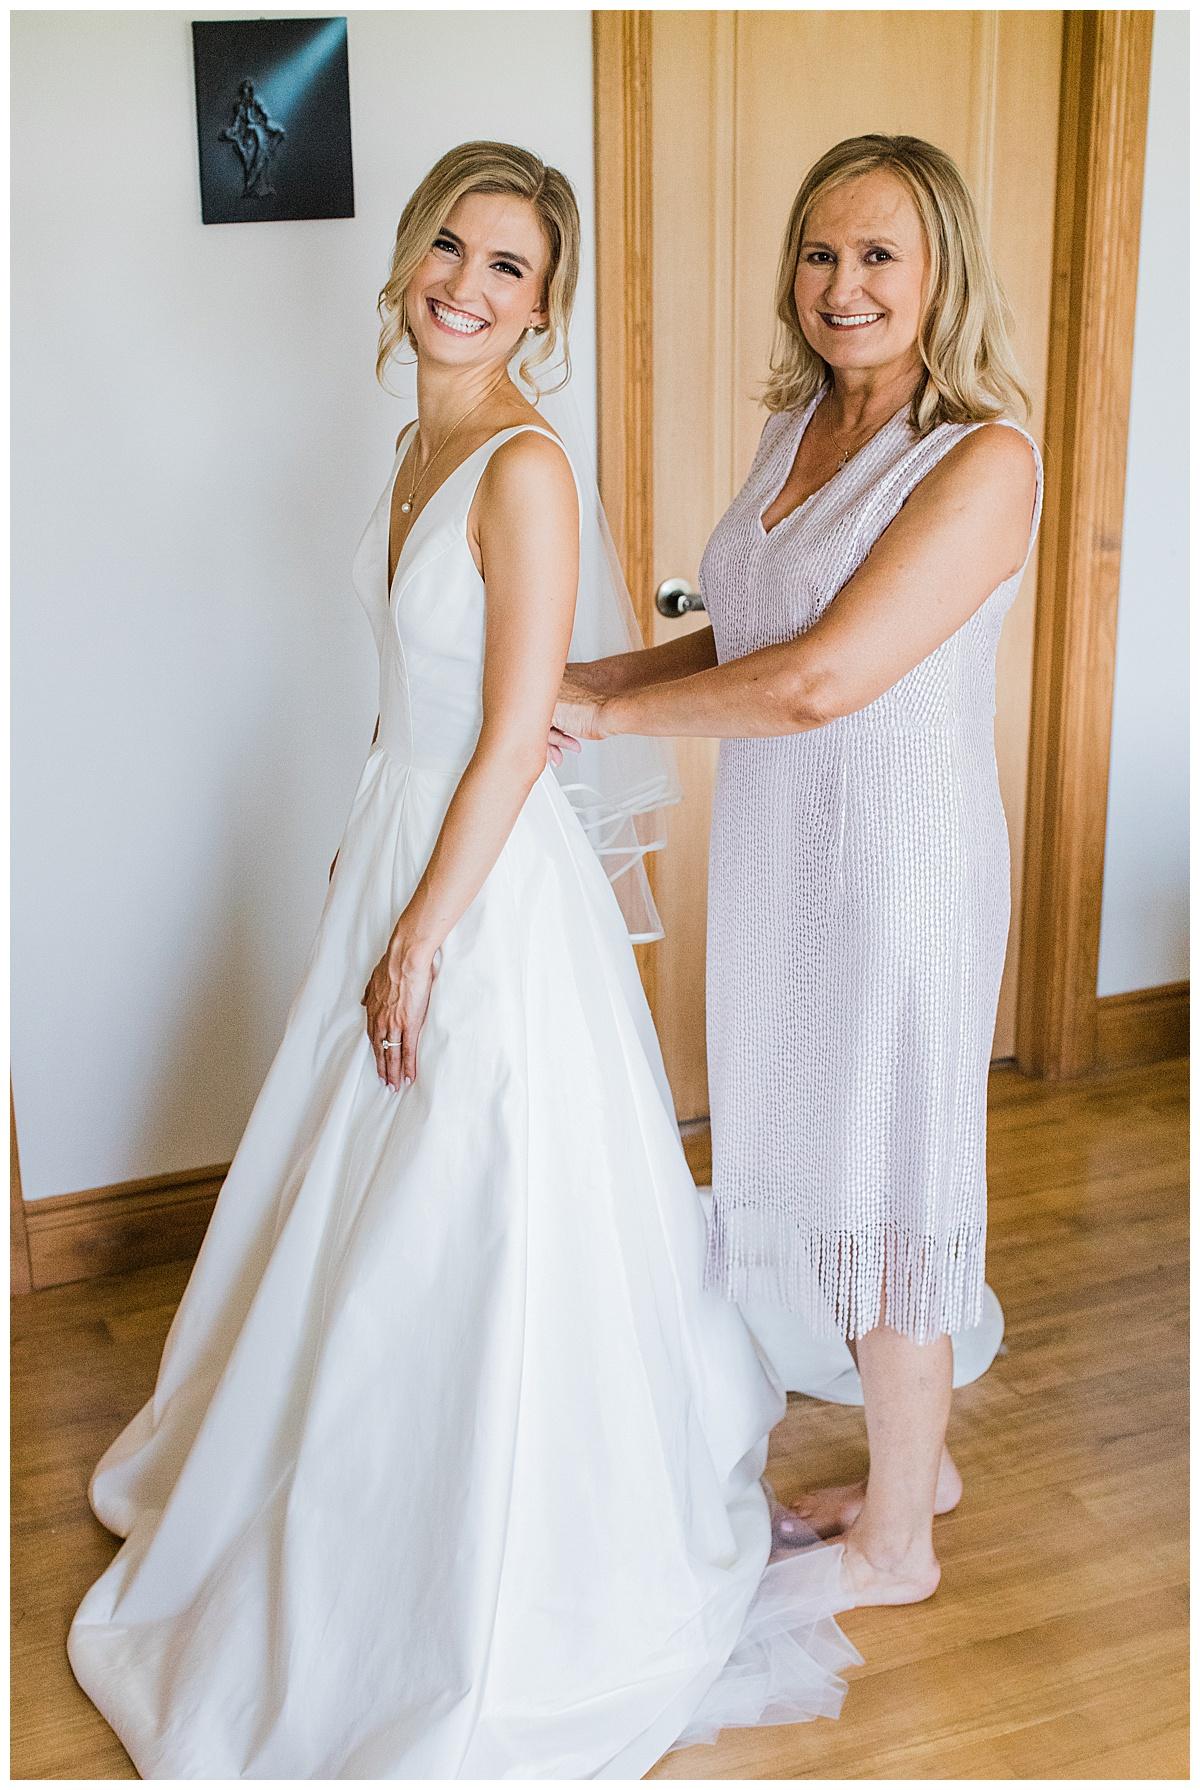 Bride's mother zipping her into her dress  Ontario Wedding  Toronto wedding photography  3photograpy